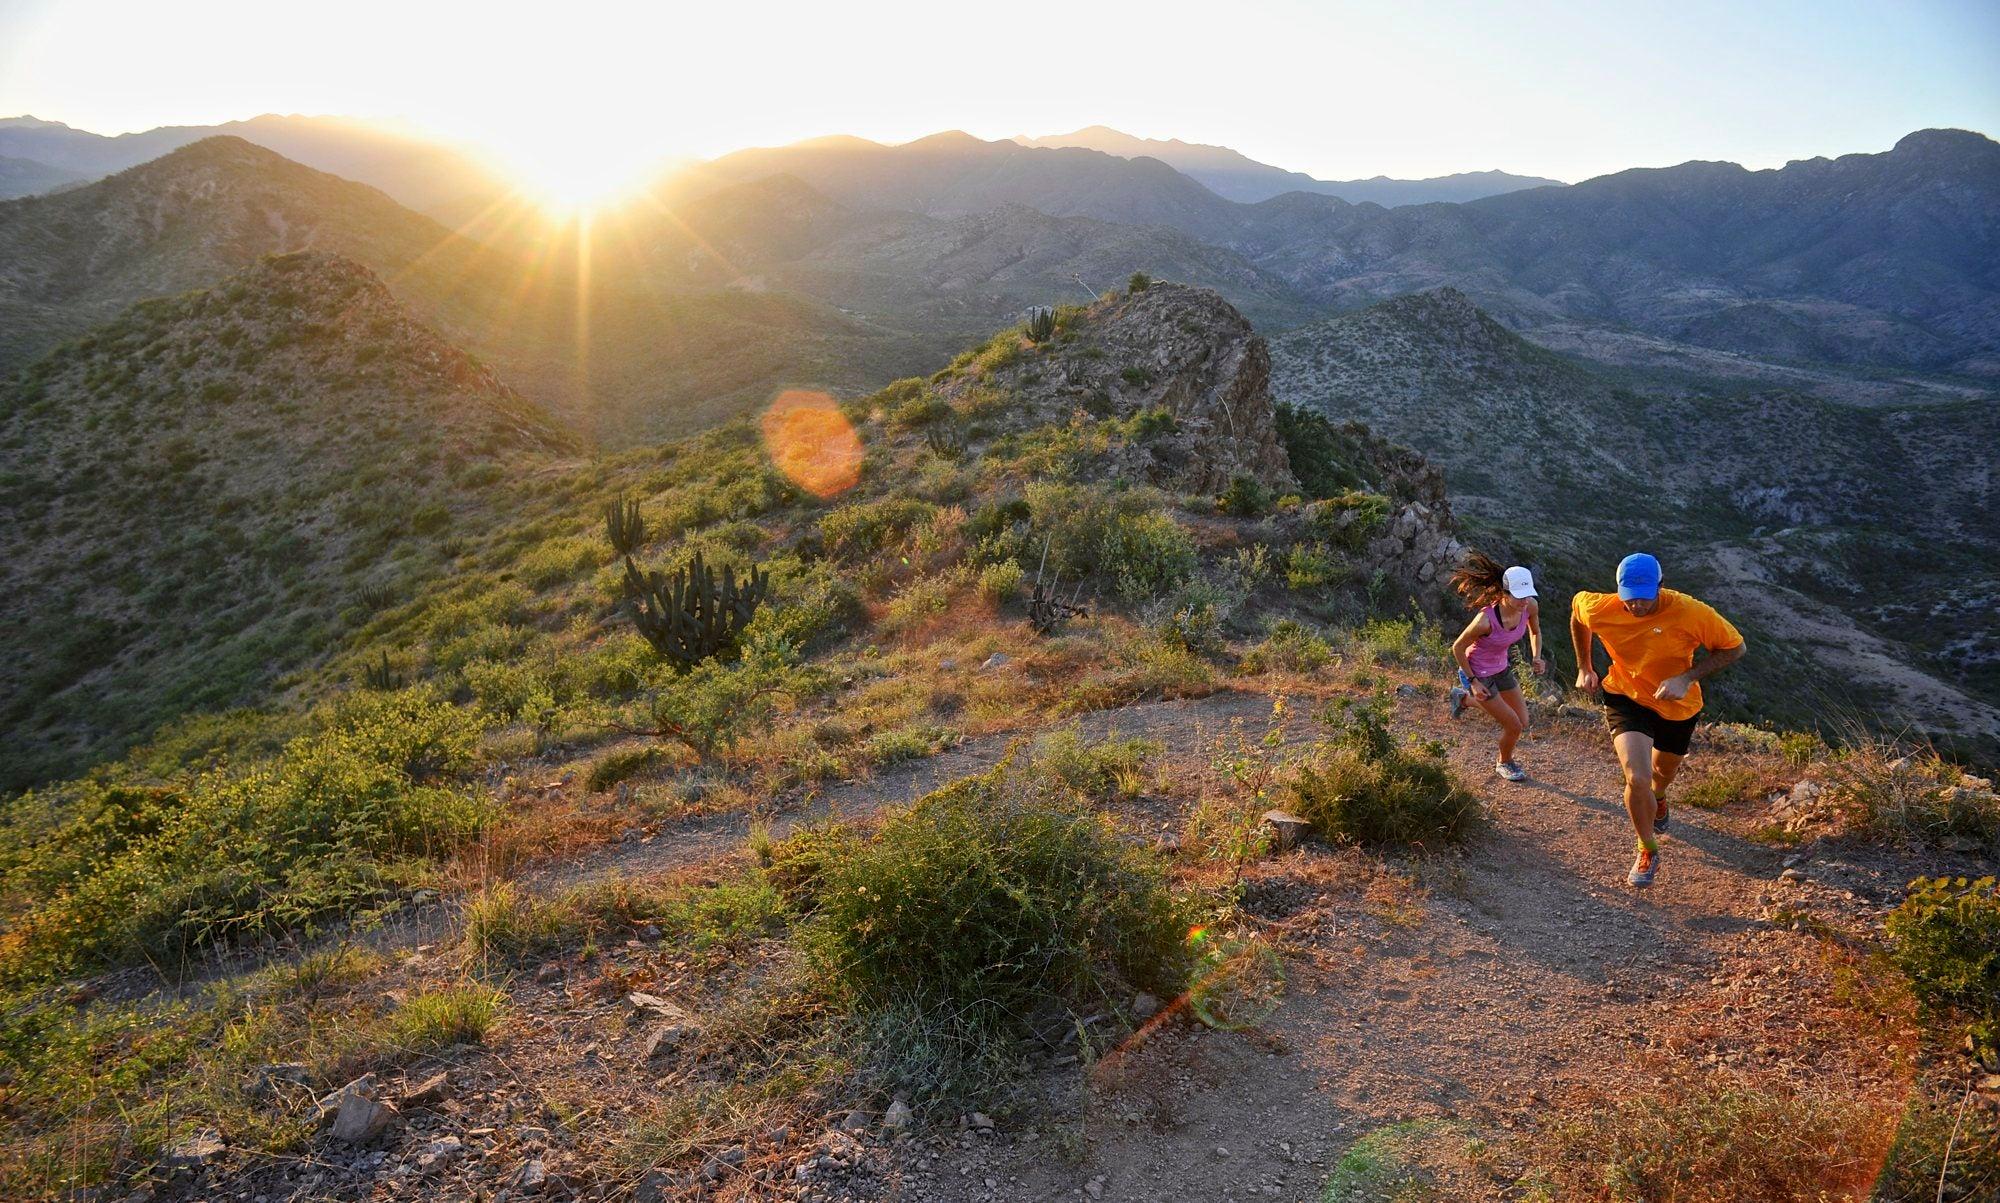 Hot Weather Running Tips From An Ultrarunning Coach